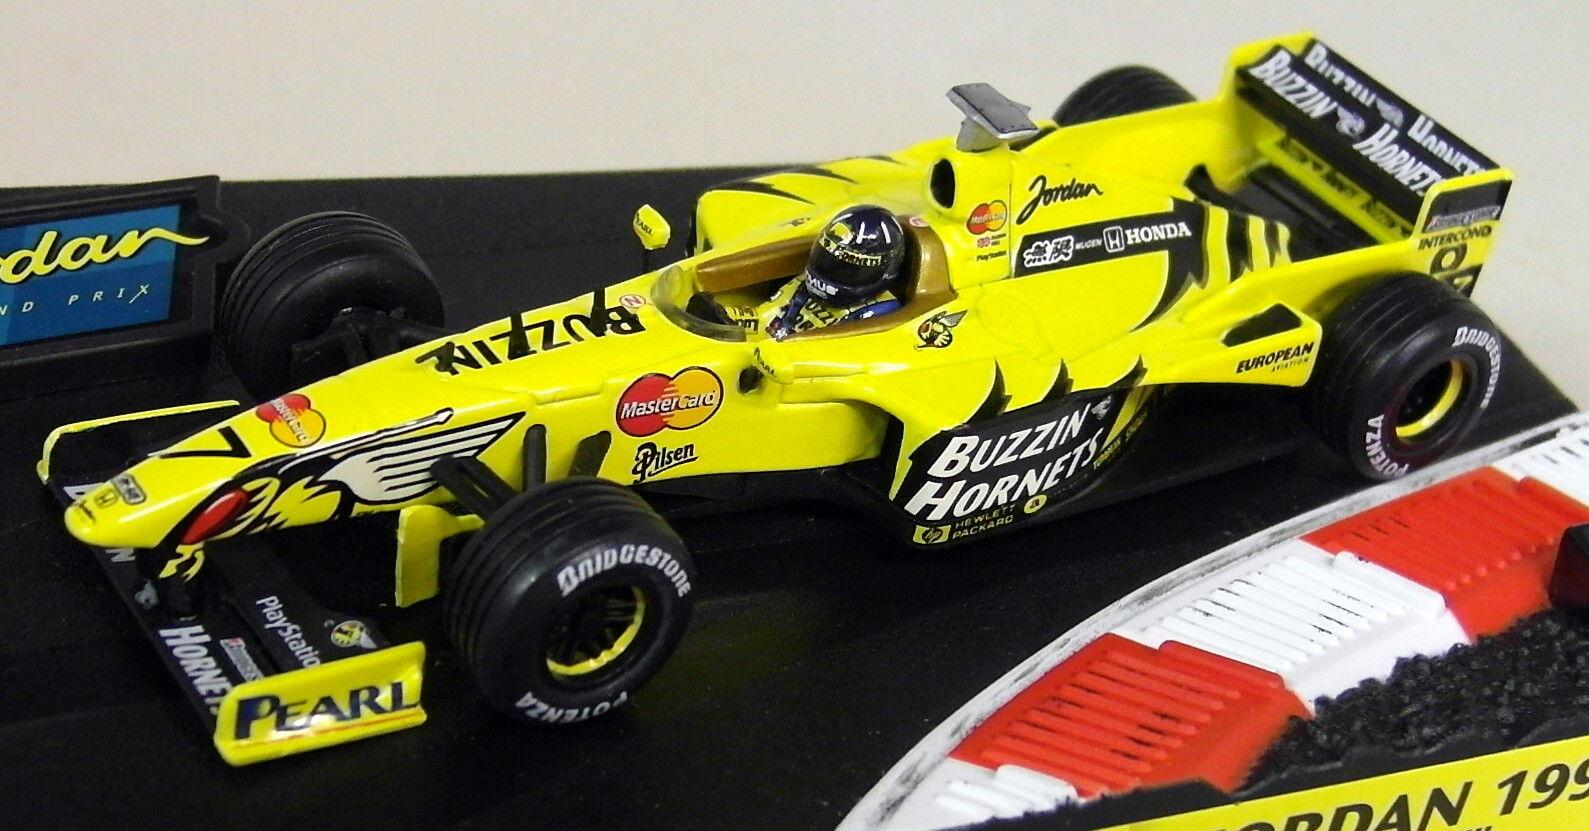 Hot Wheels 1 43 Scale - 22811 Jordan 199 Damon Hill F1 Diecast Model Car